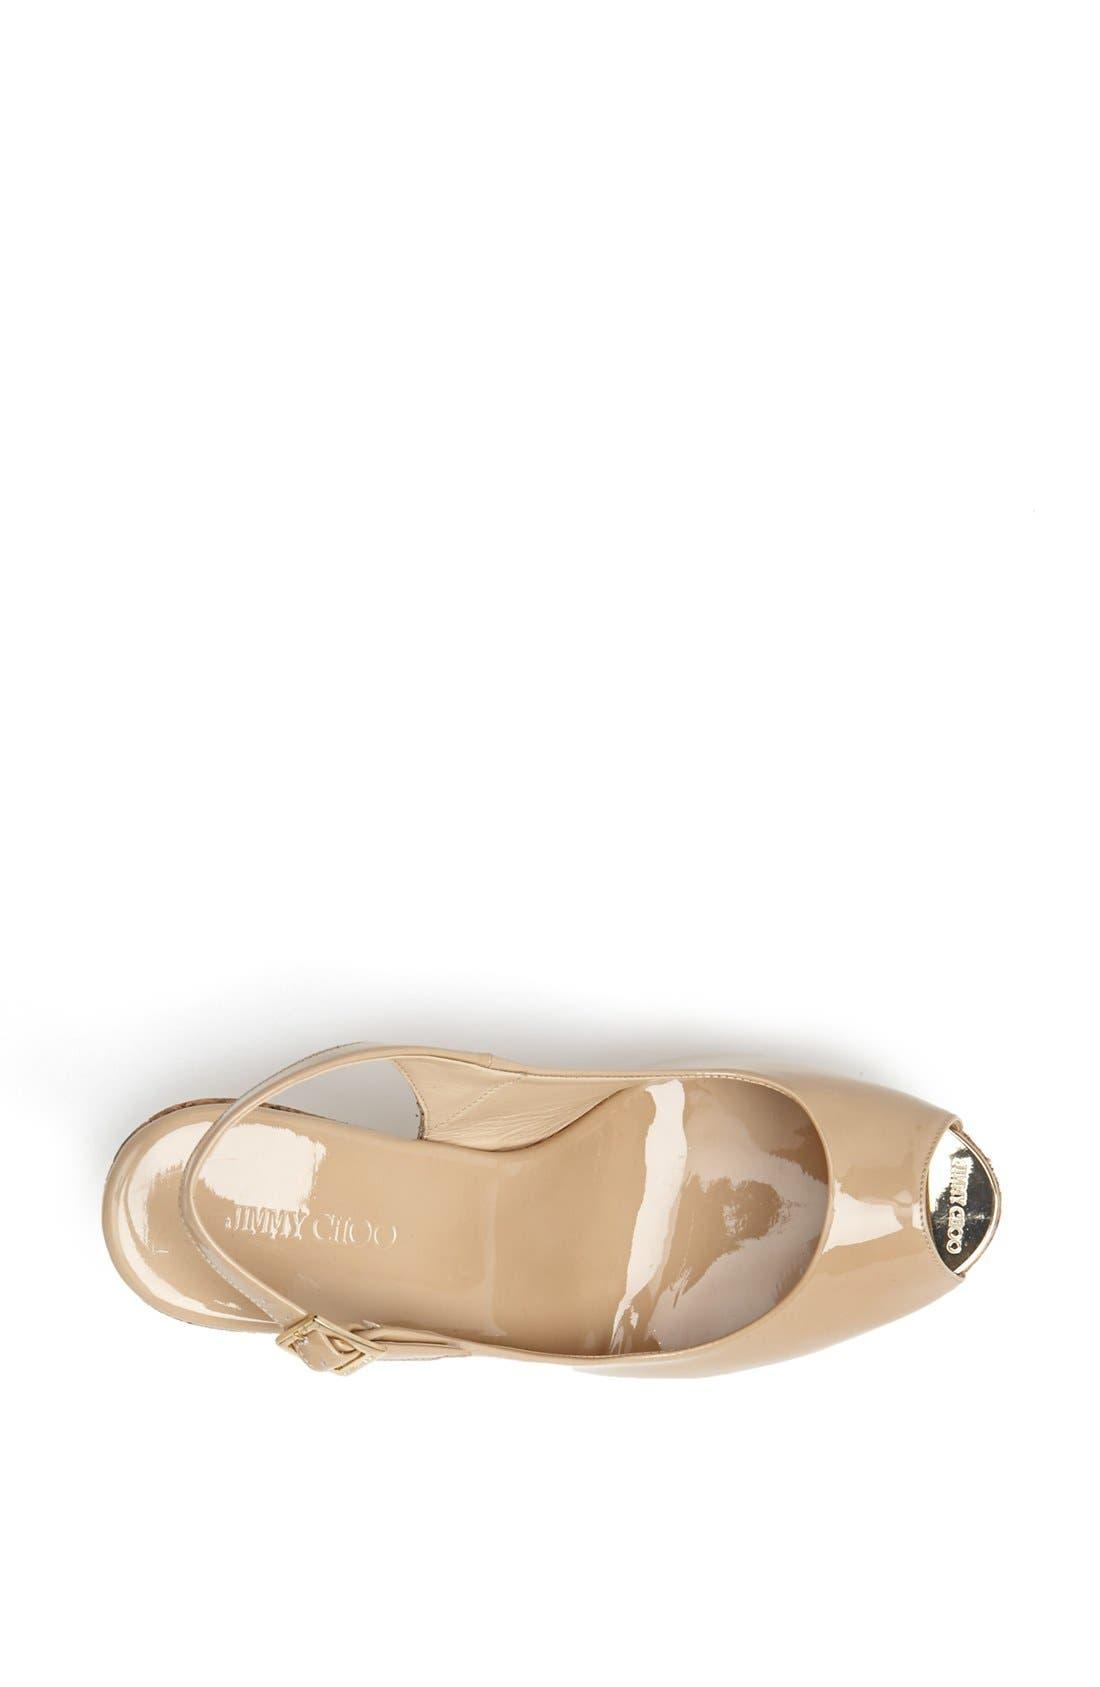 'Prova' Cork Slingback Wedge Sandal,                             Alternate thumbnail 3, color,                             Nude